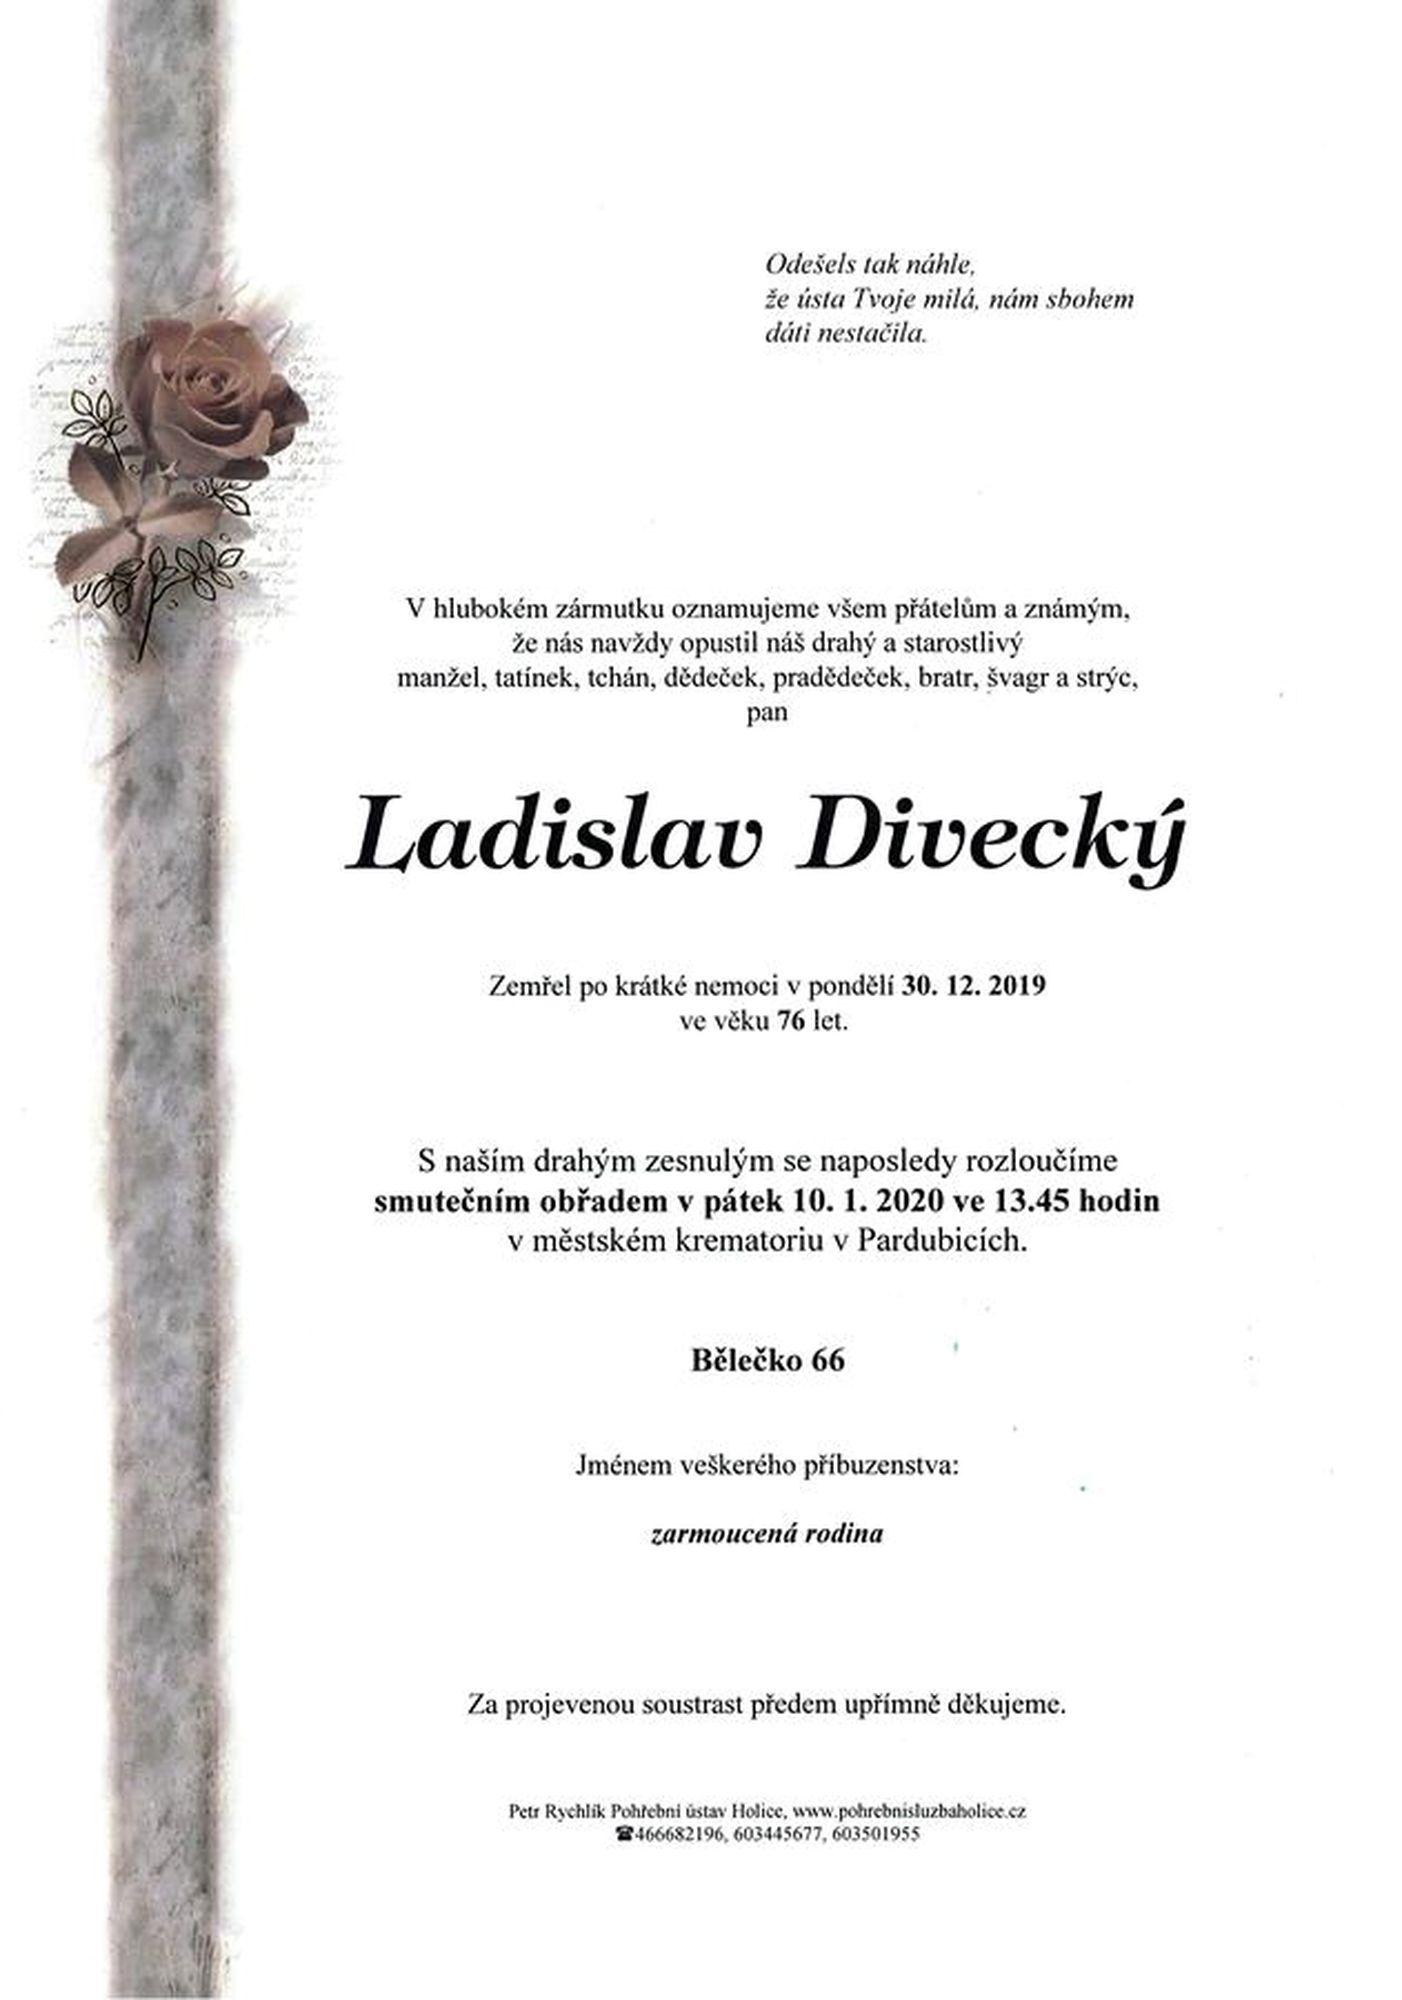 Ladislav Divecký